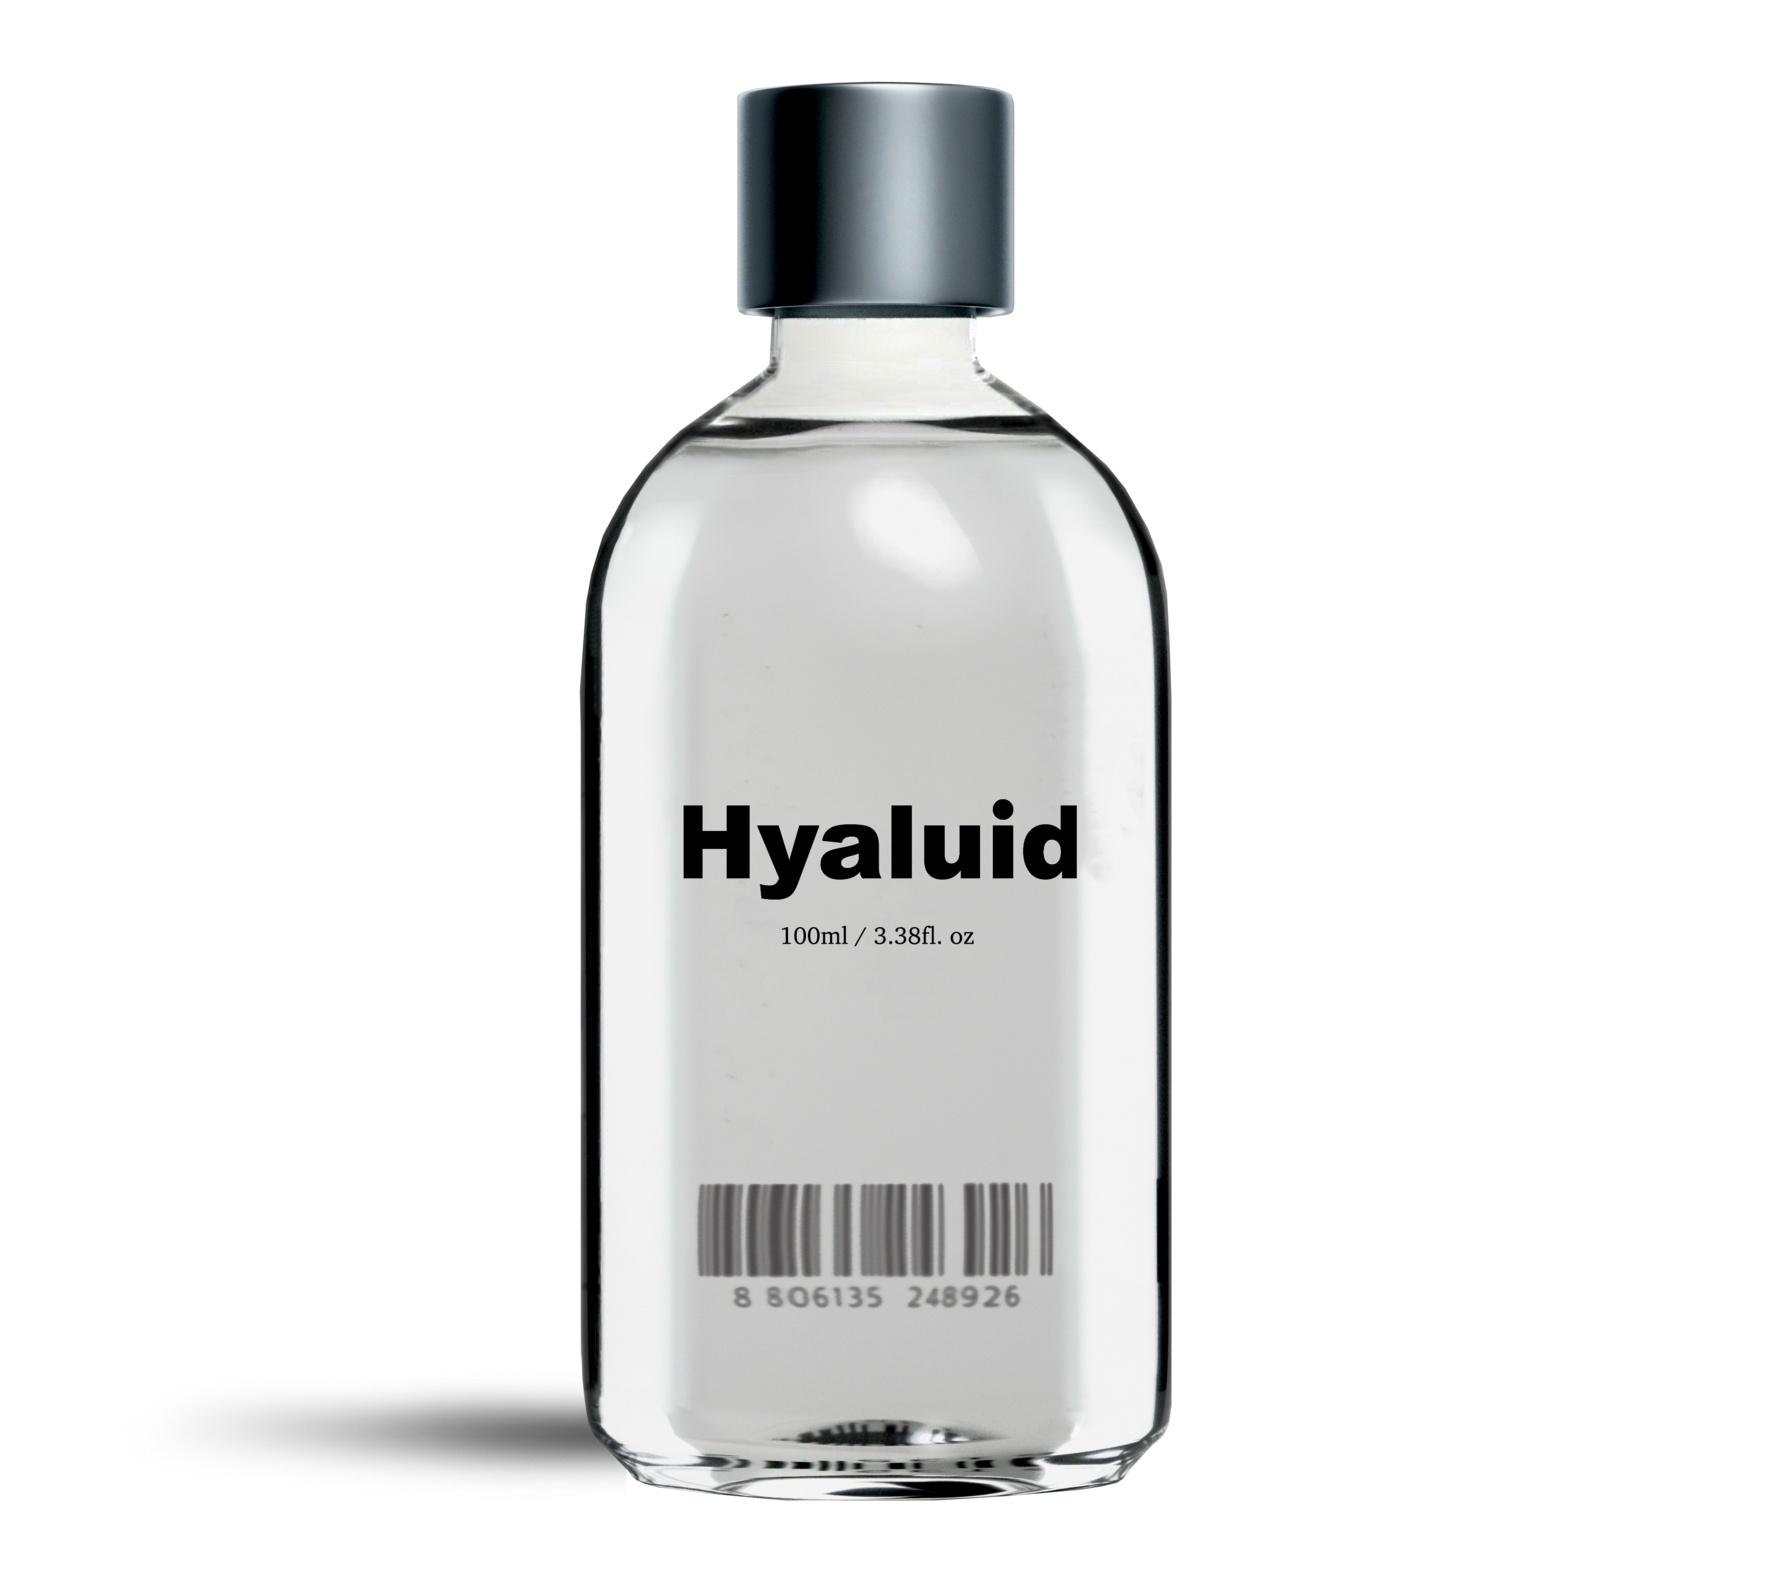 Slurp Hyaluid